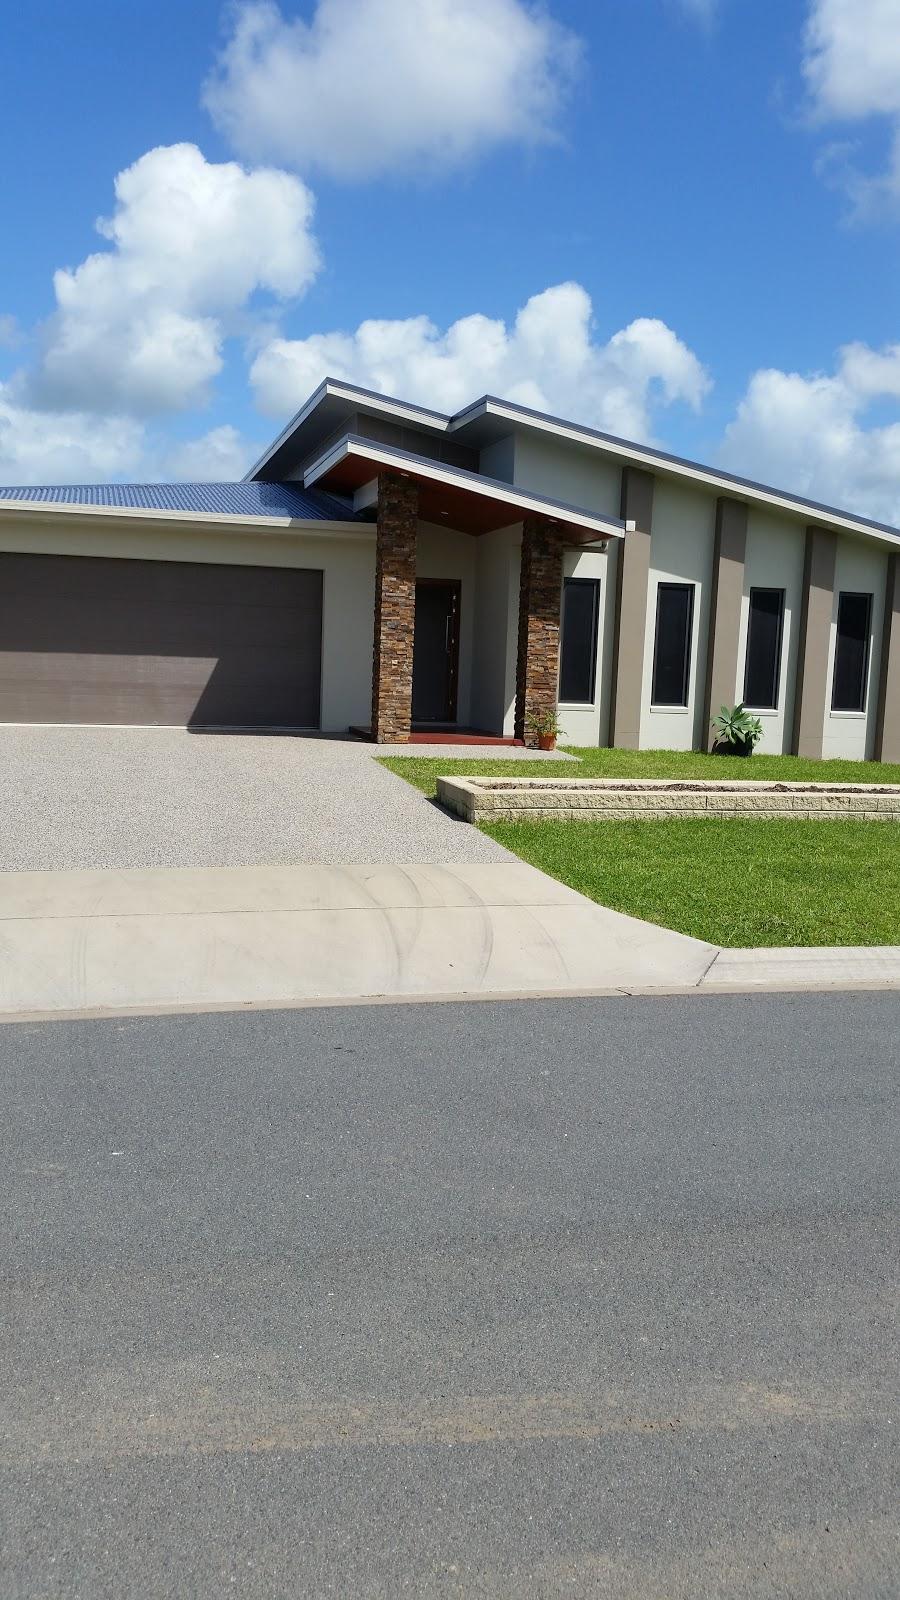 b9025929 Titan Homes Pty Ltd - Real estate agency | 14 Froghollow Dr, Ooralea ...